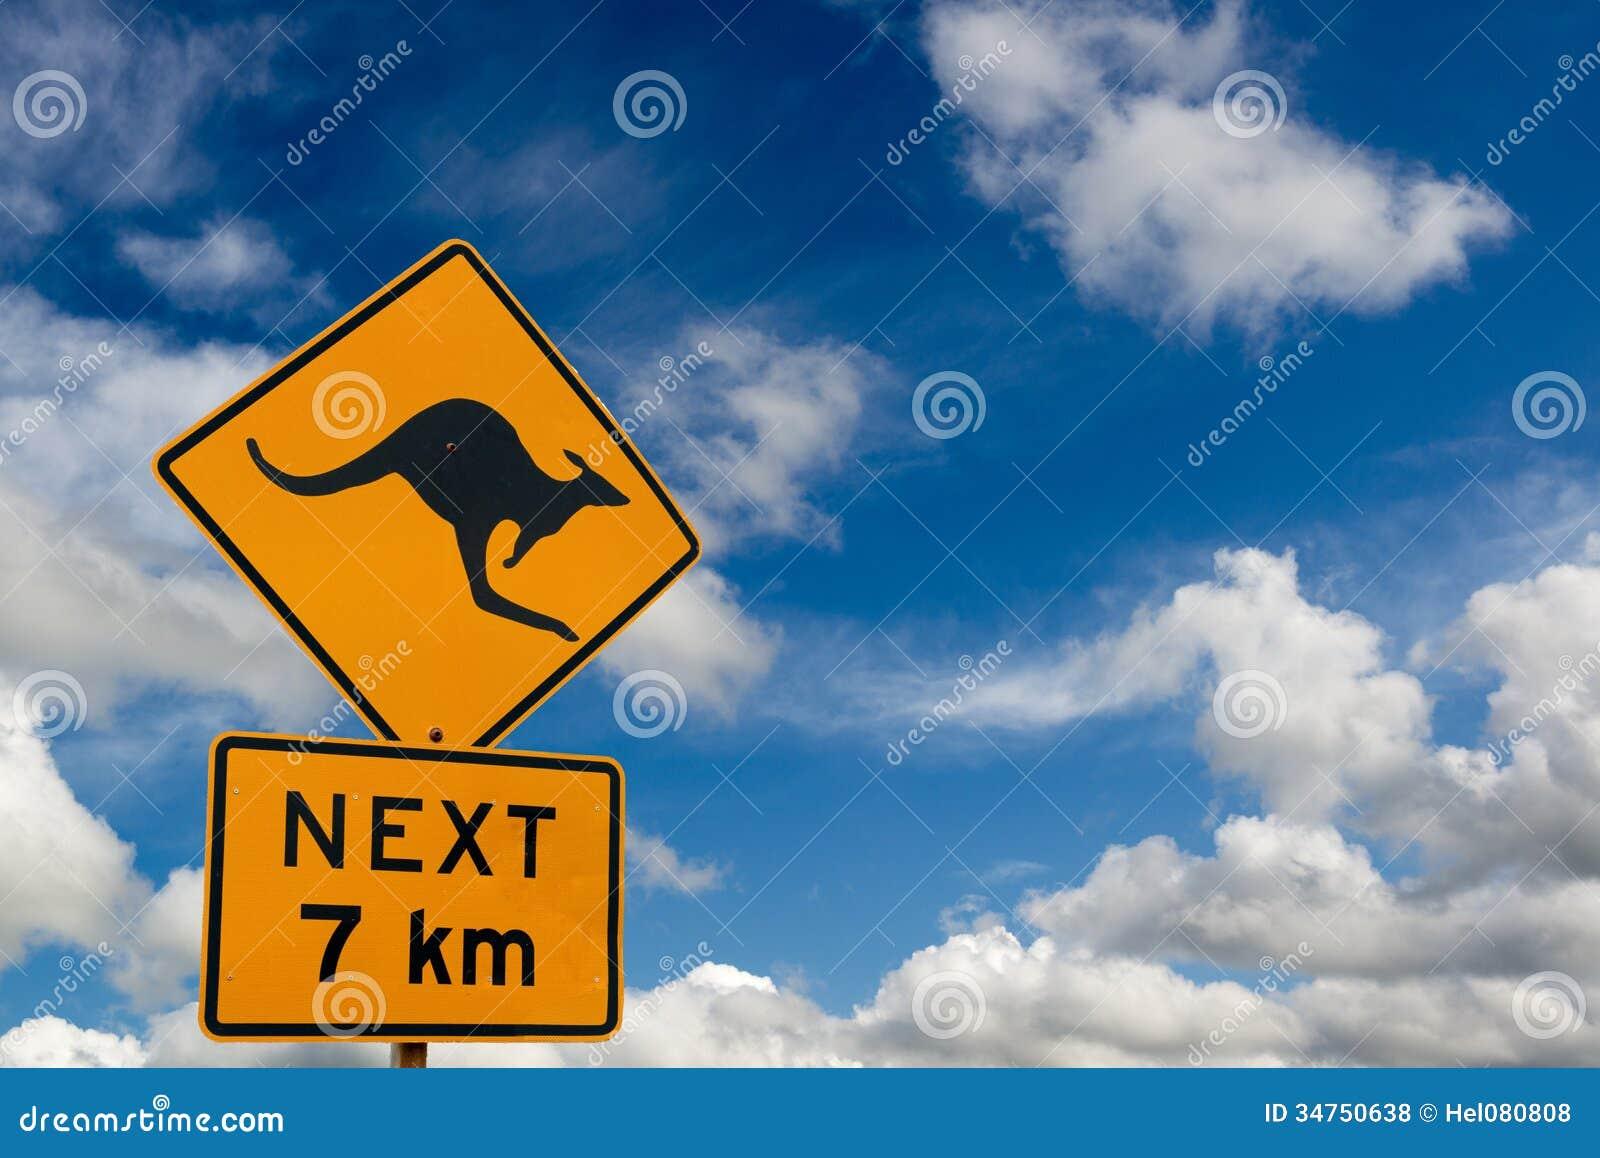 Attention kangaroo sign